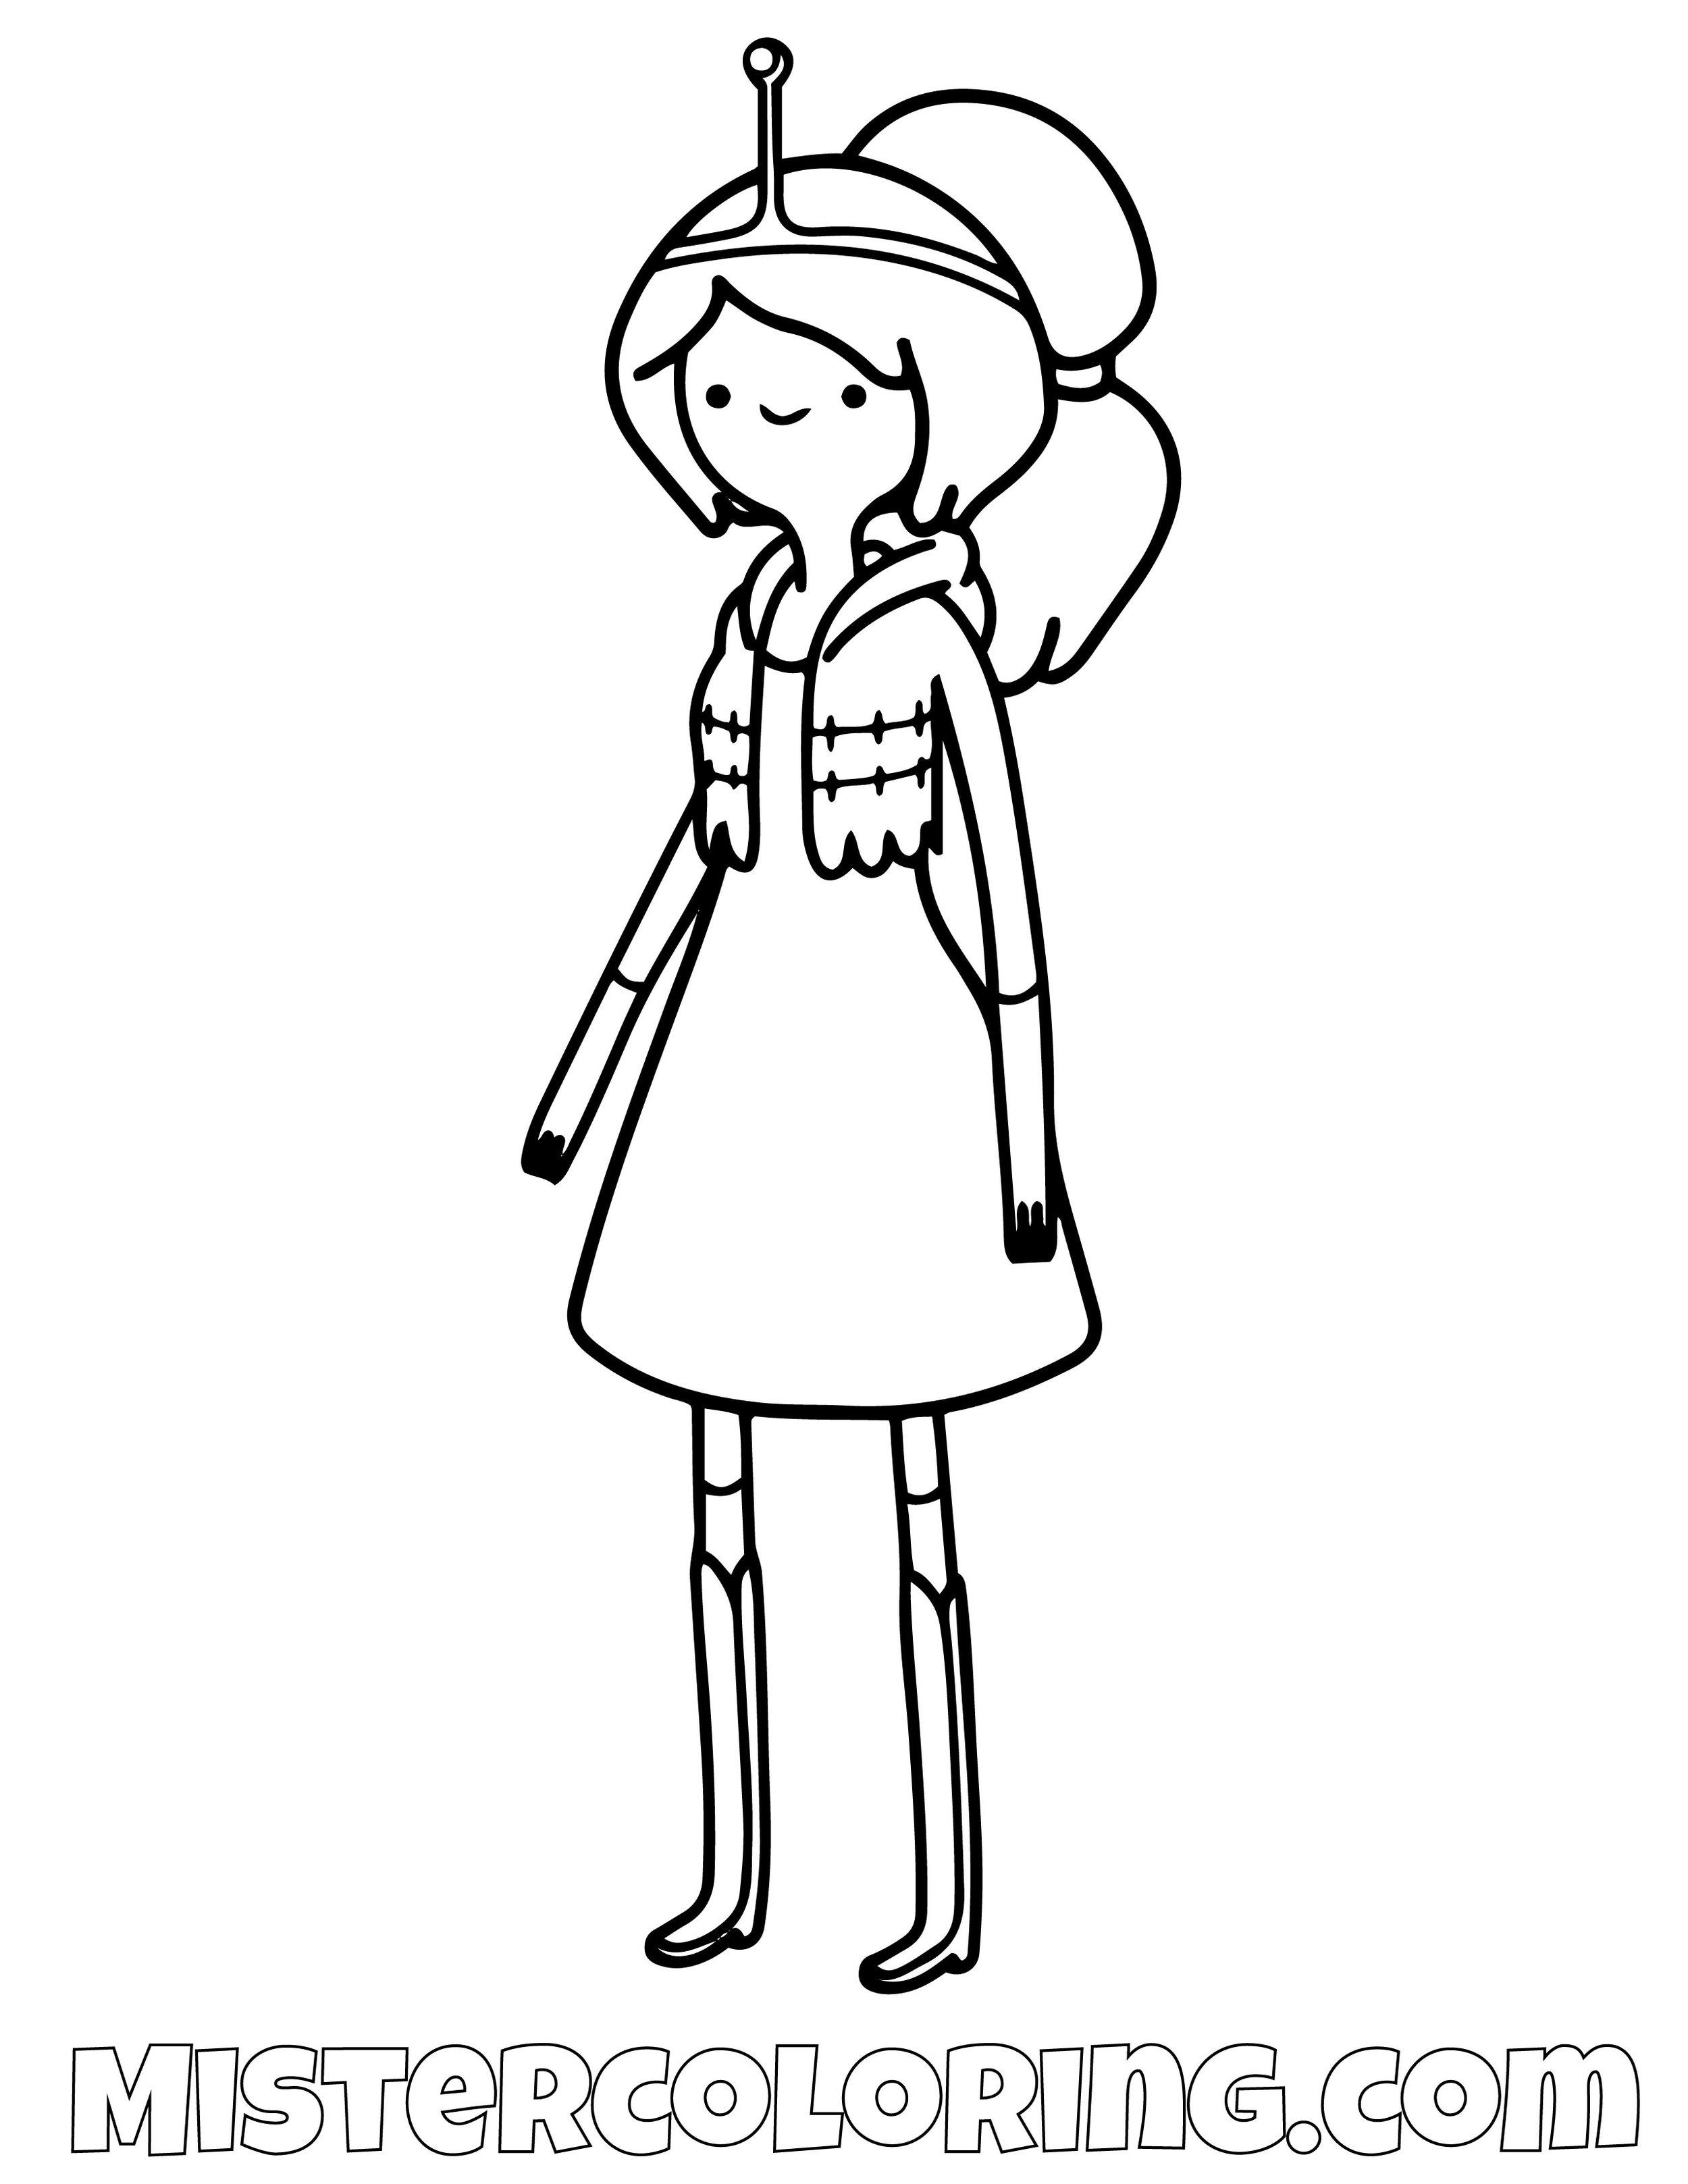 Princess Bubblegum Posing Adventure Time Coloring Page